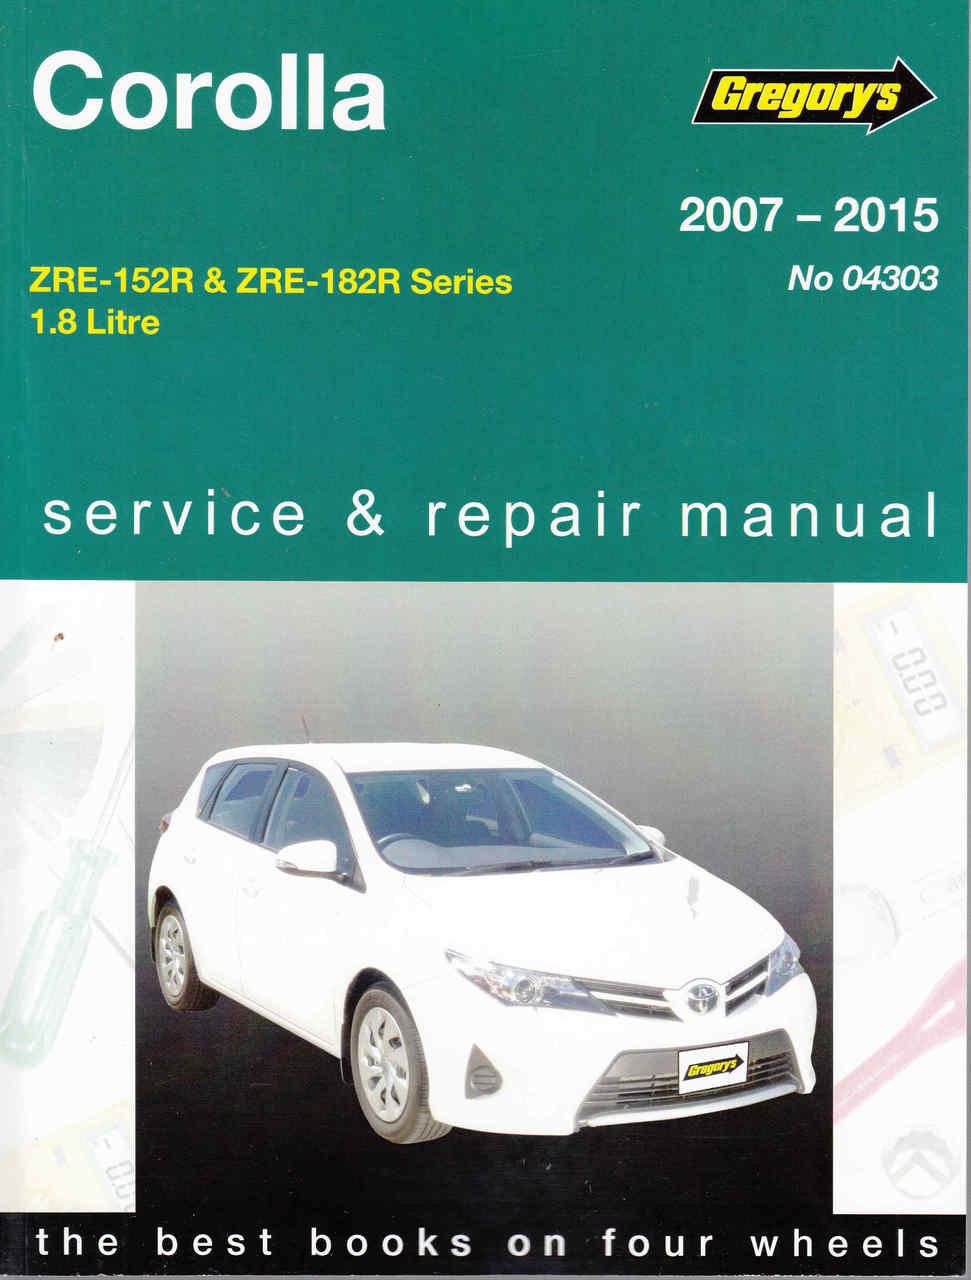 Toyota Corolla Repair Manual: Tire wheel